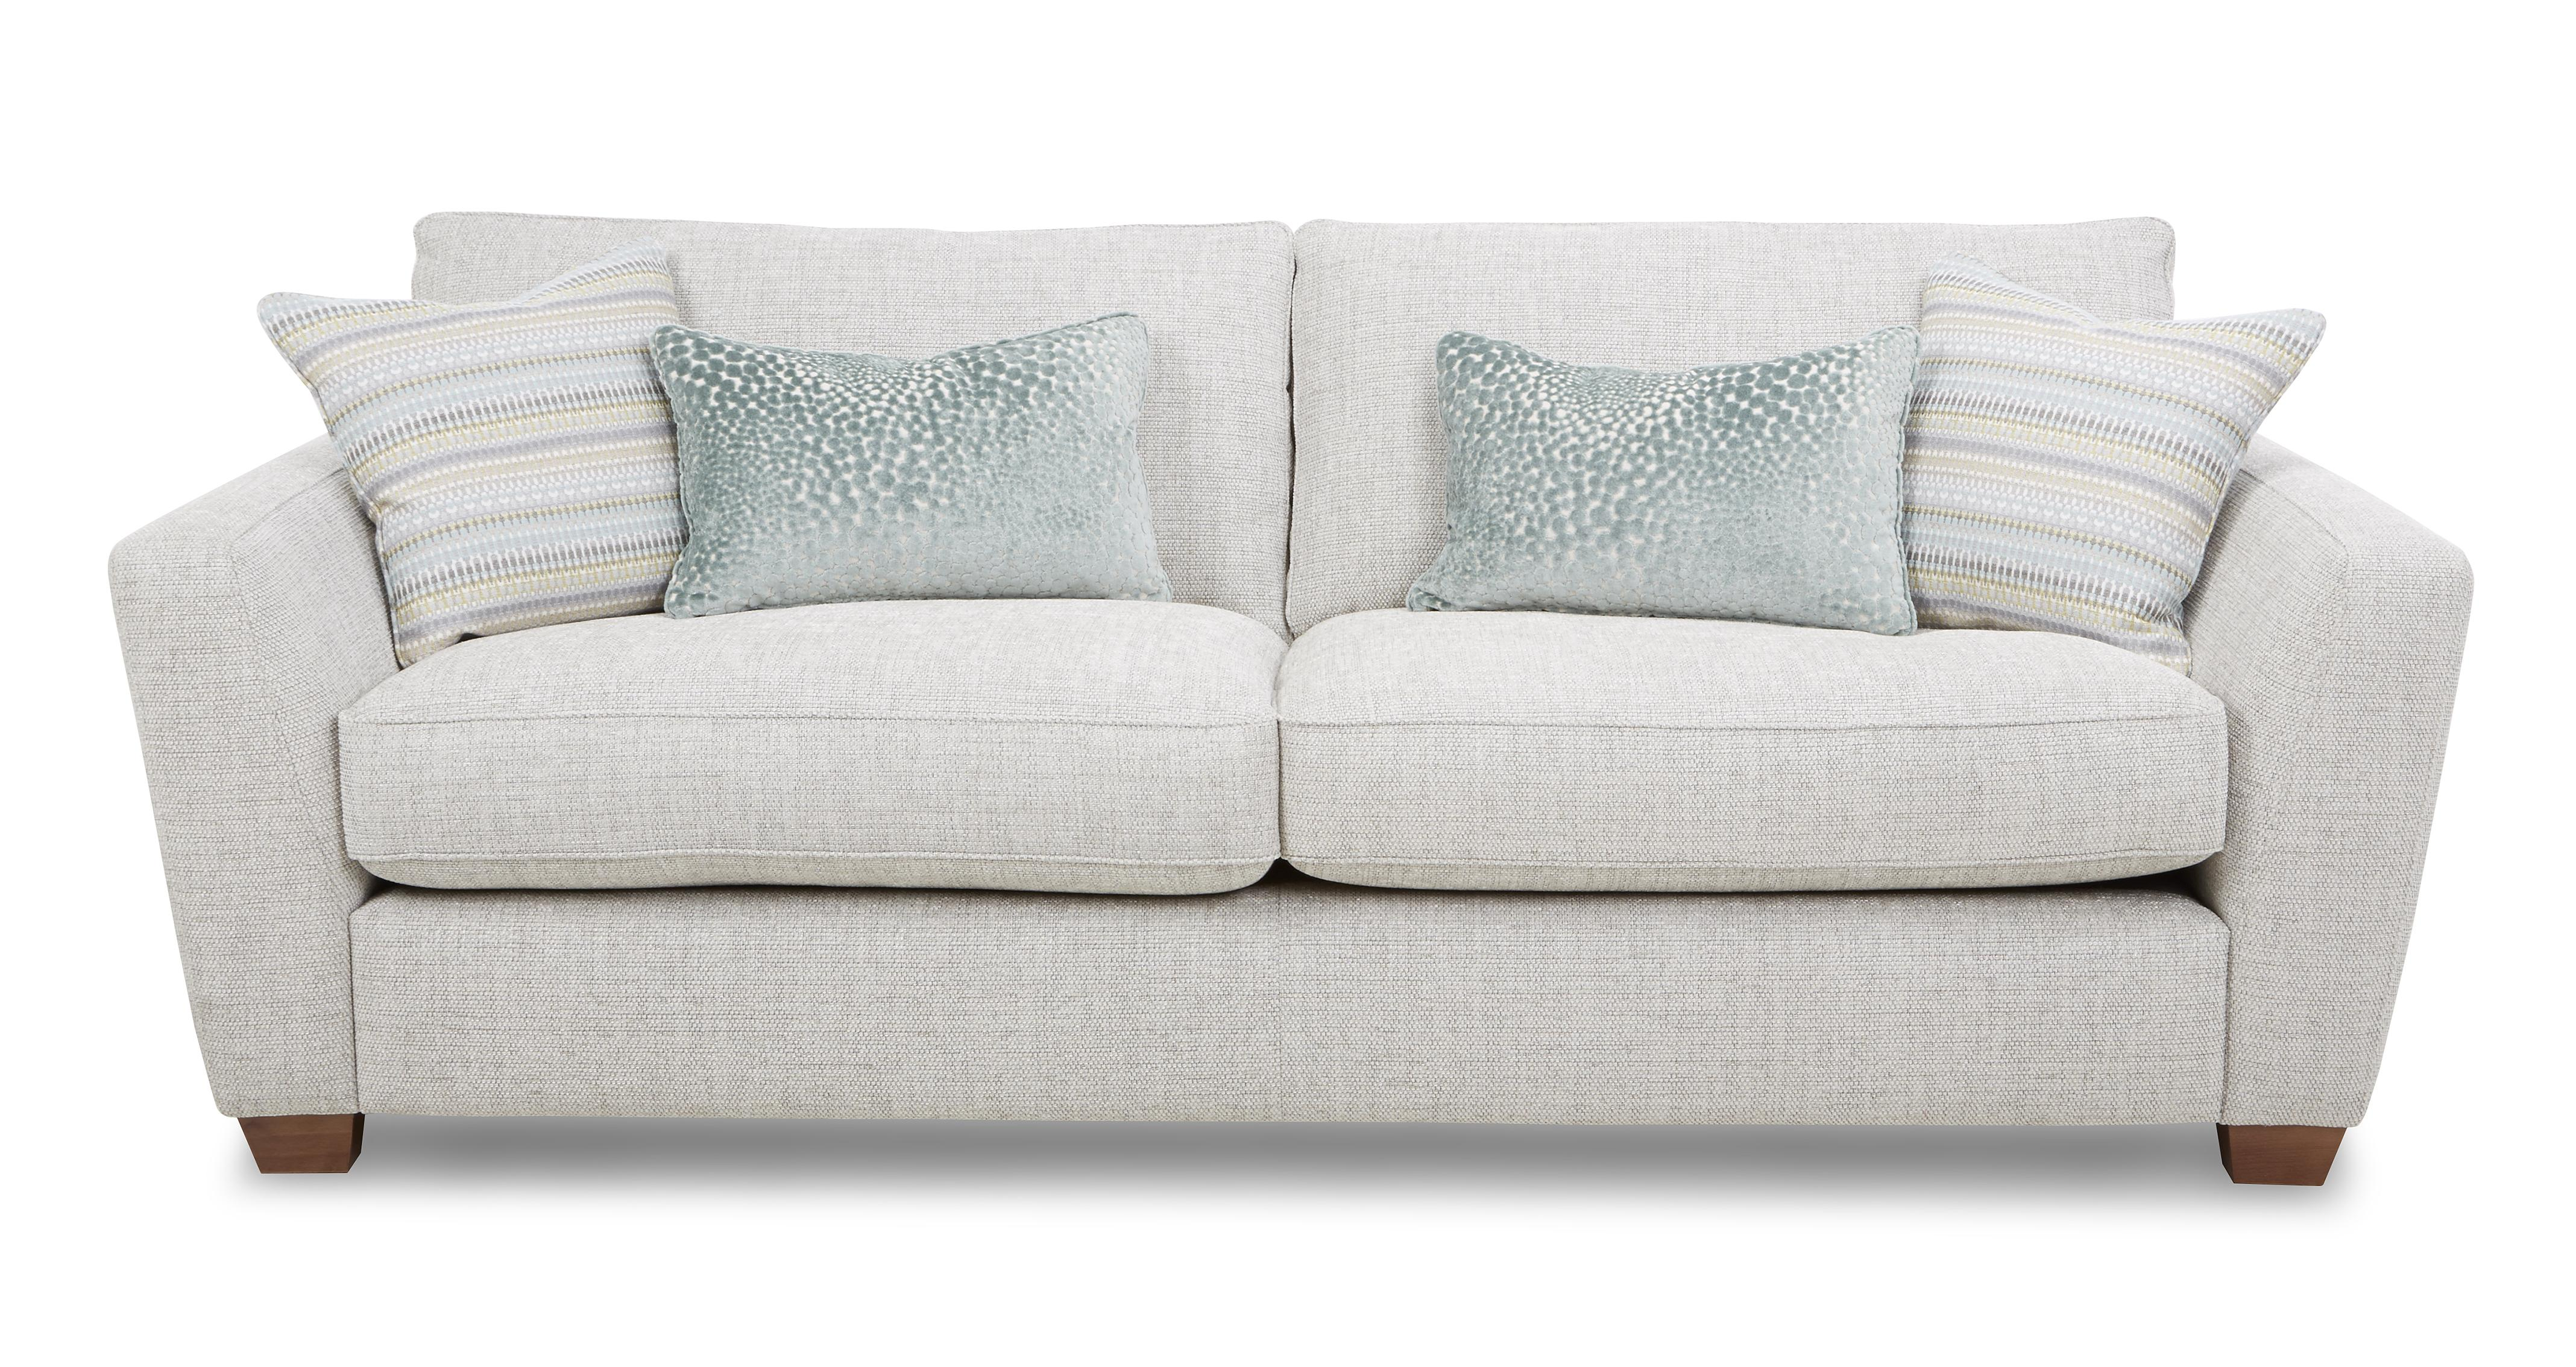 sophia sofa range dwr raleigh dfs fabric brokeasshome